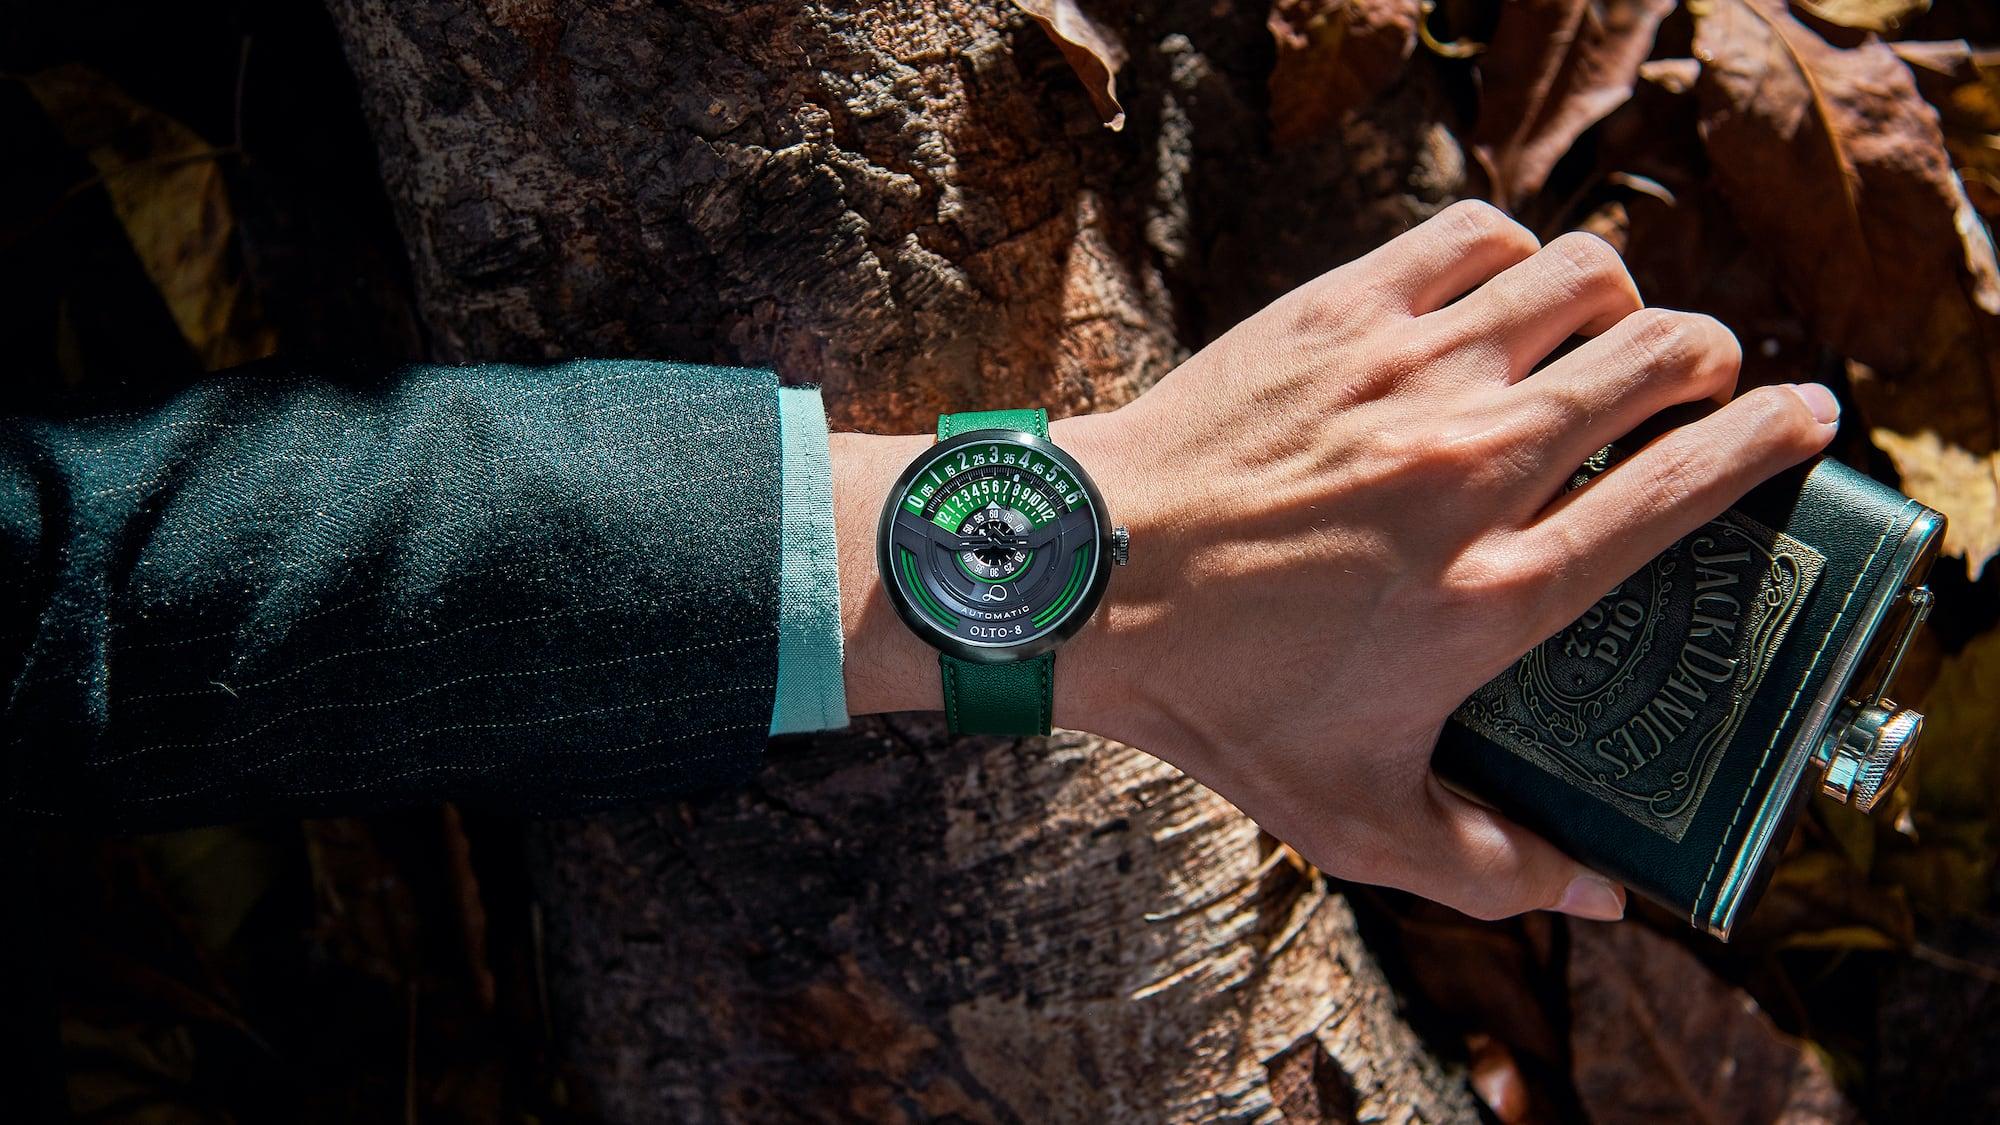 OLTO-8 INFINITY Innovative Mechanical Watch